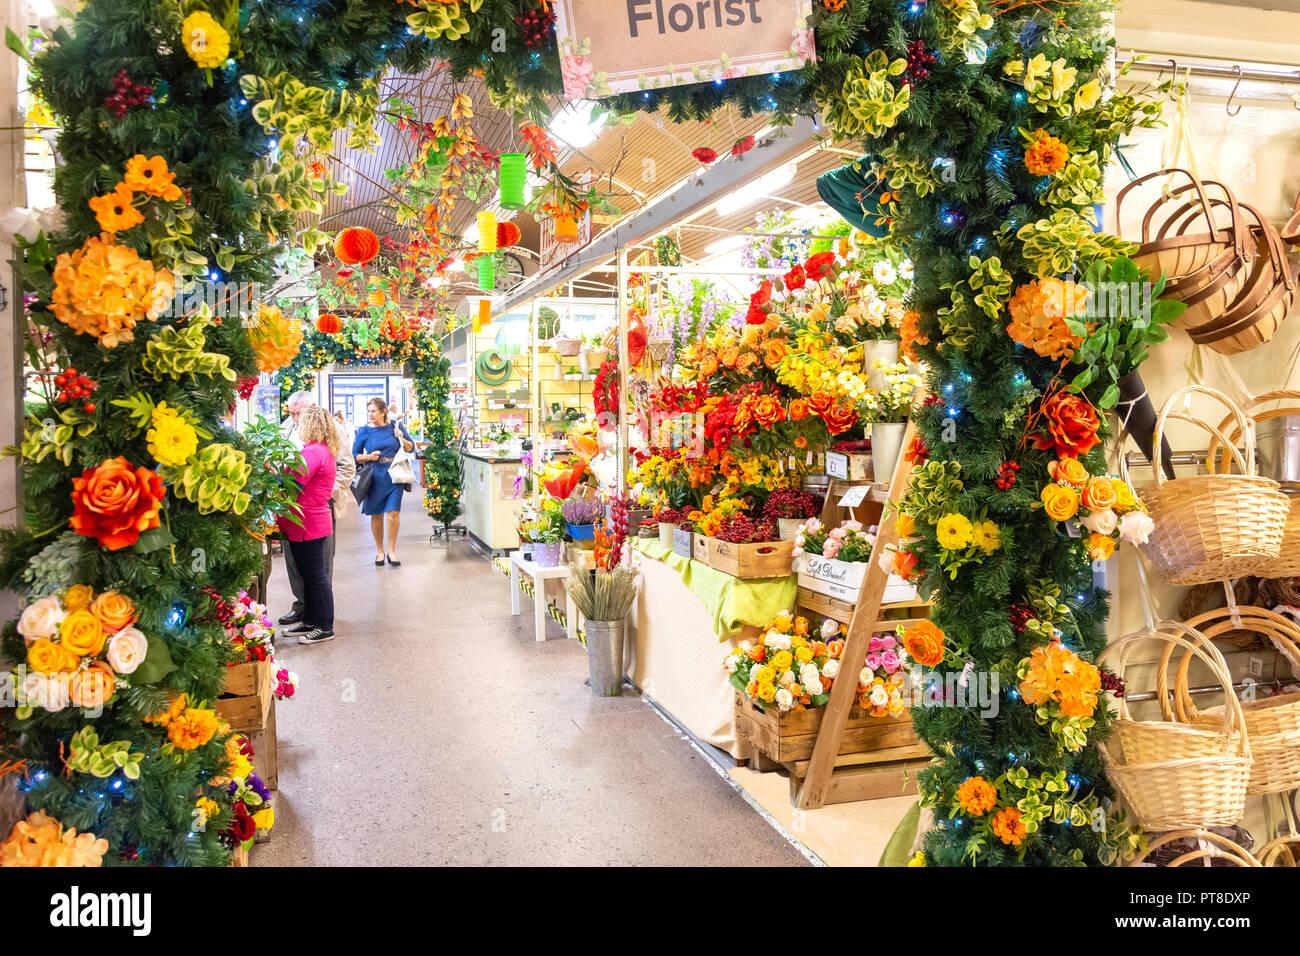 Florist Stall, Hereford Butter Markt, Market Hall, High Street, Hereford, Herefordshire, England, Vereinigtes Königreich Stockbild